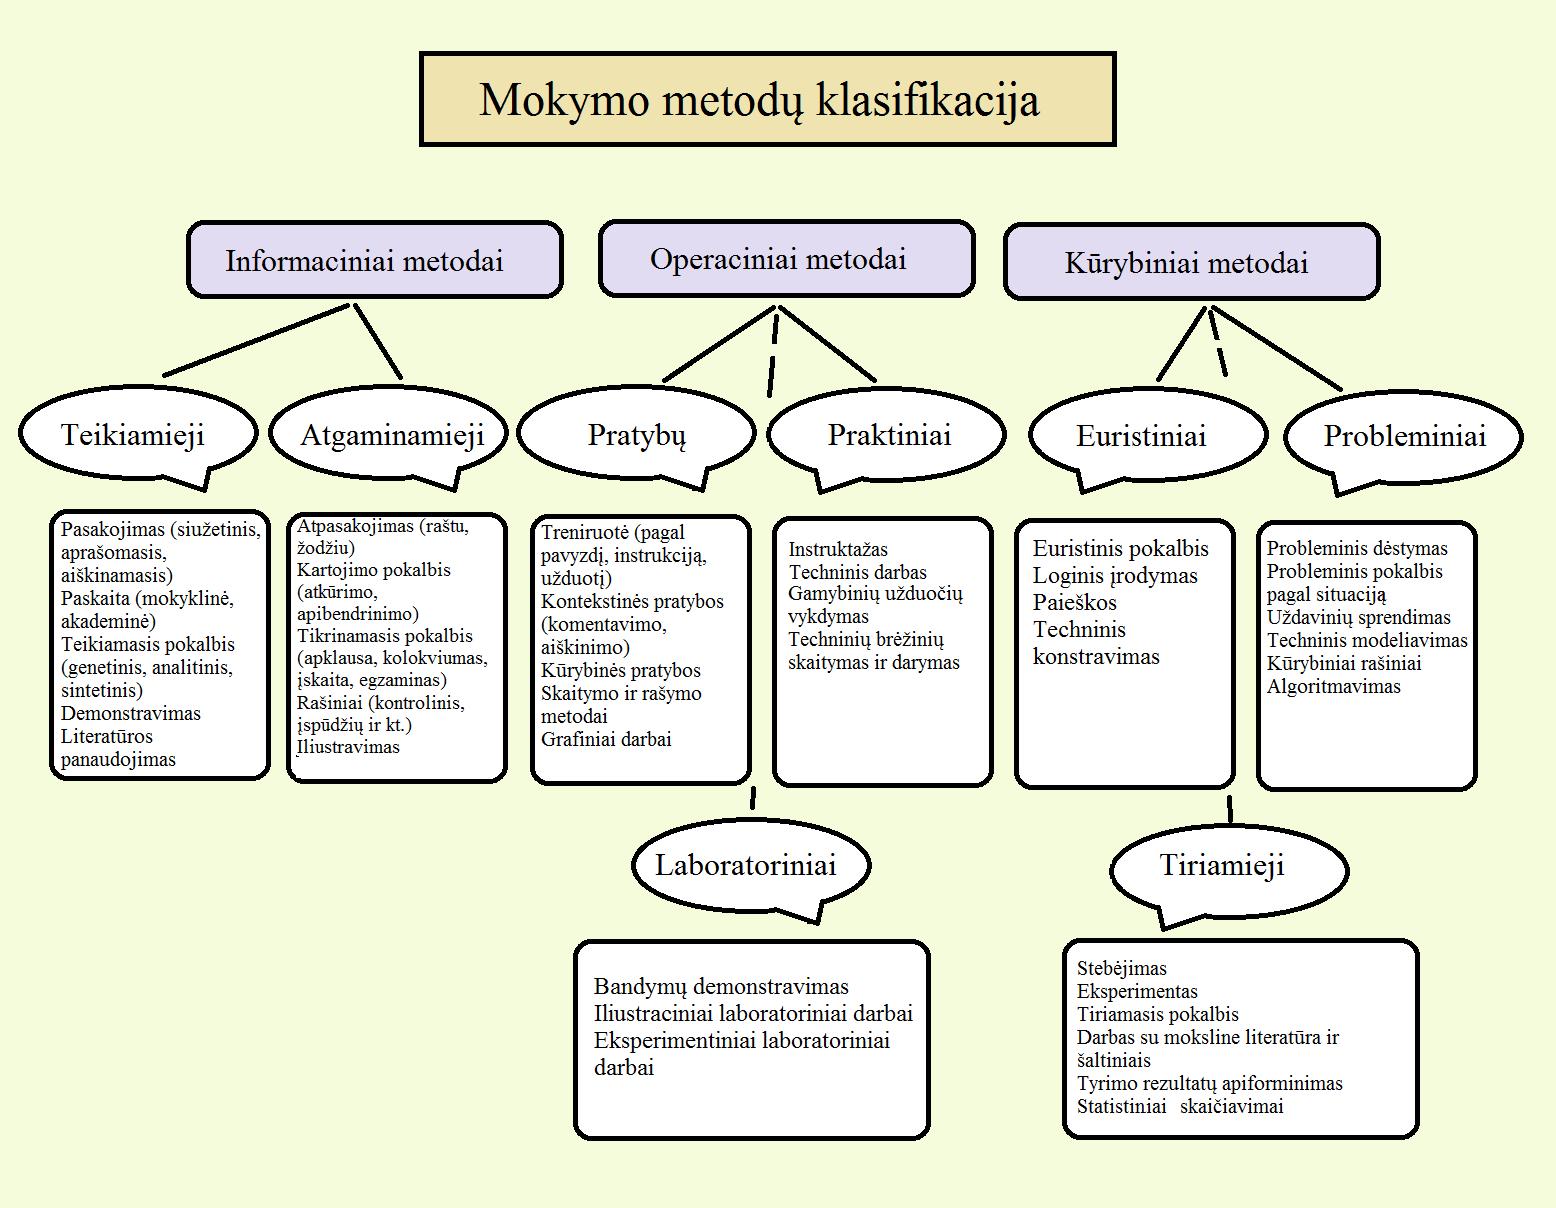 mokymo metodu klasifikacija